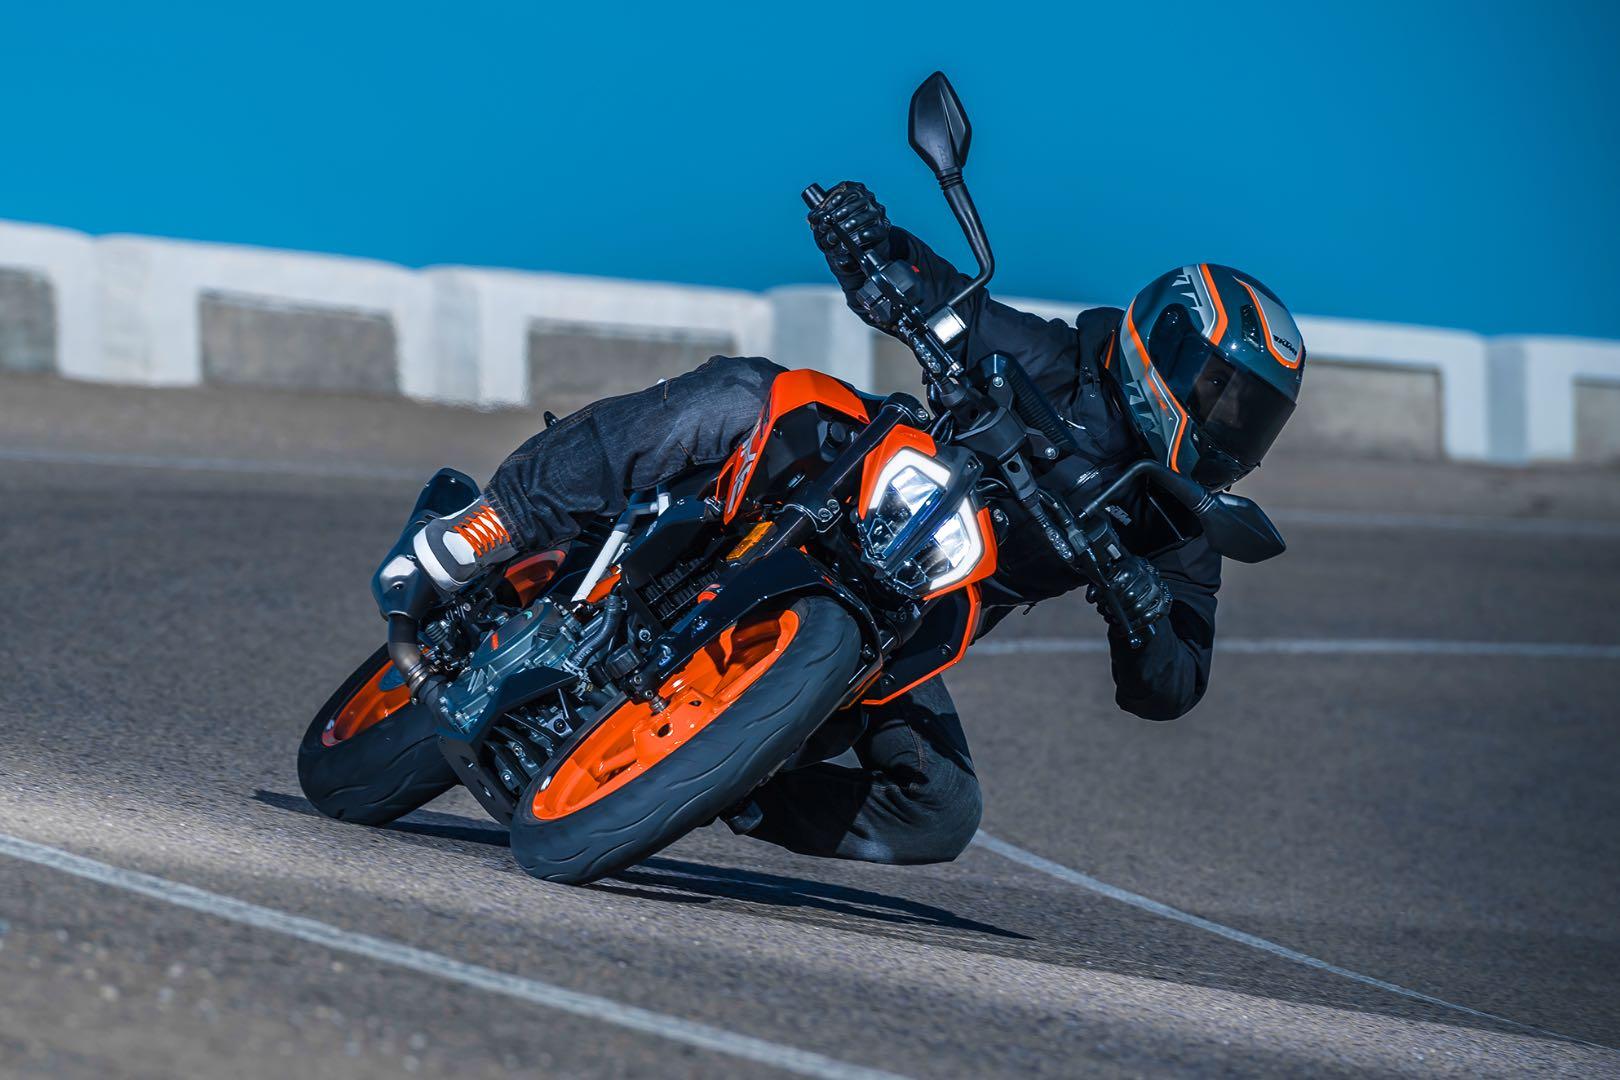 2017 KTM 390 Duke First Look | Baby Duke Gets Updated